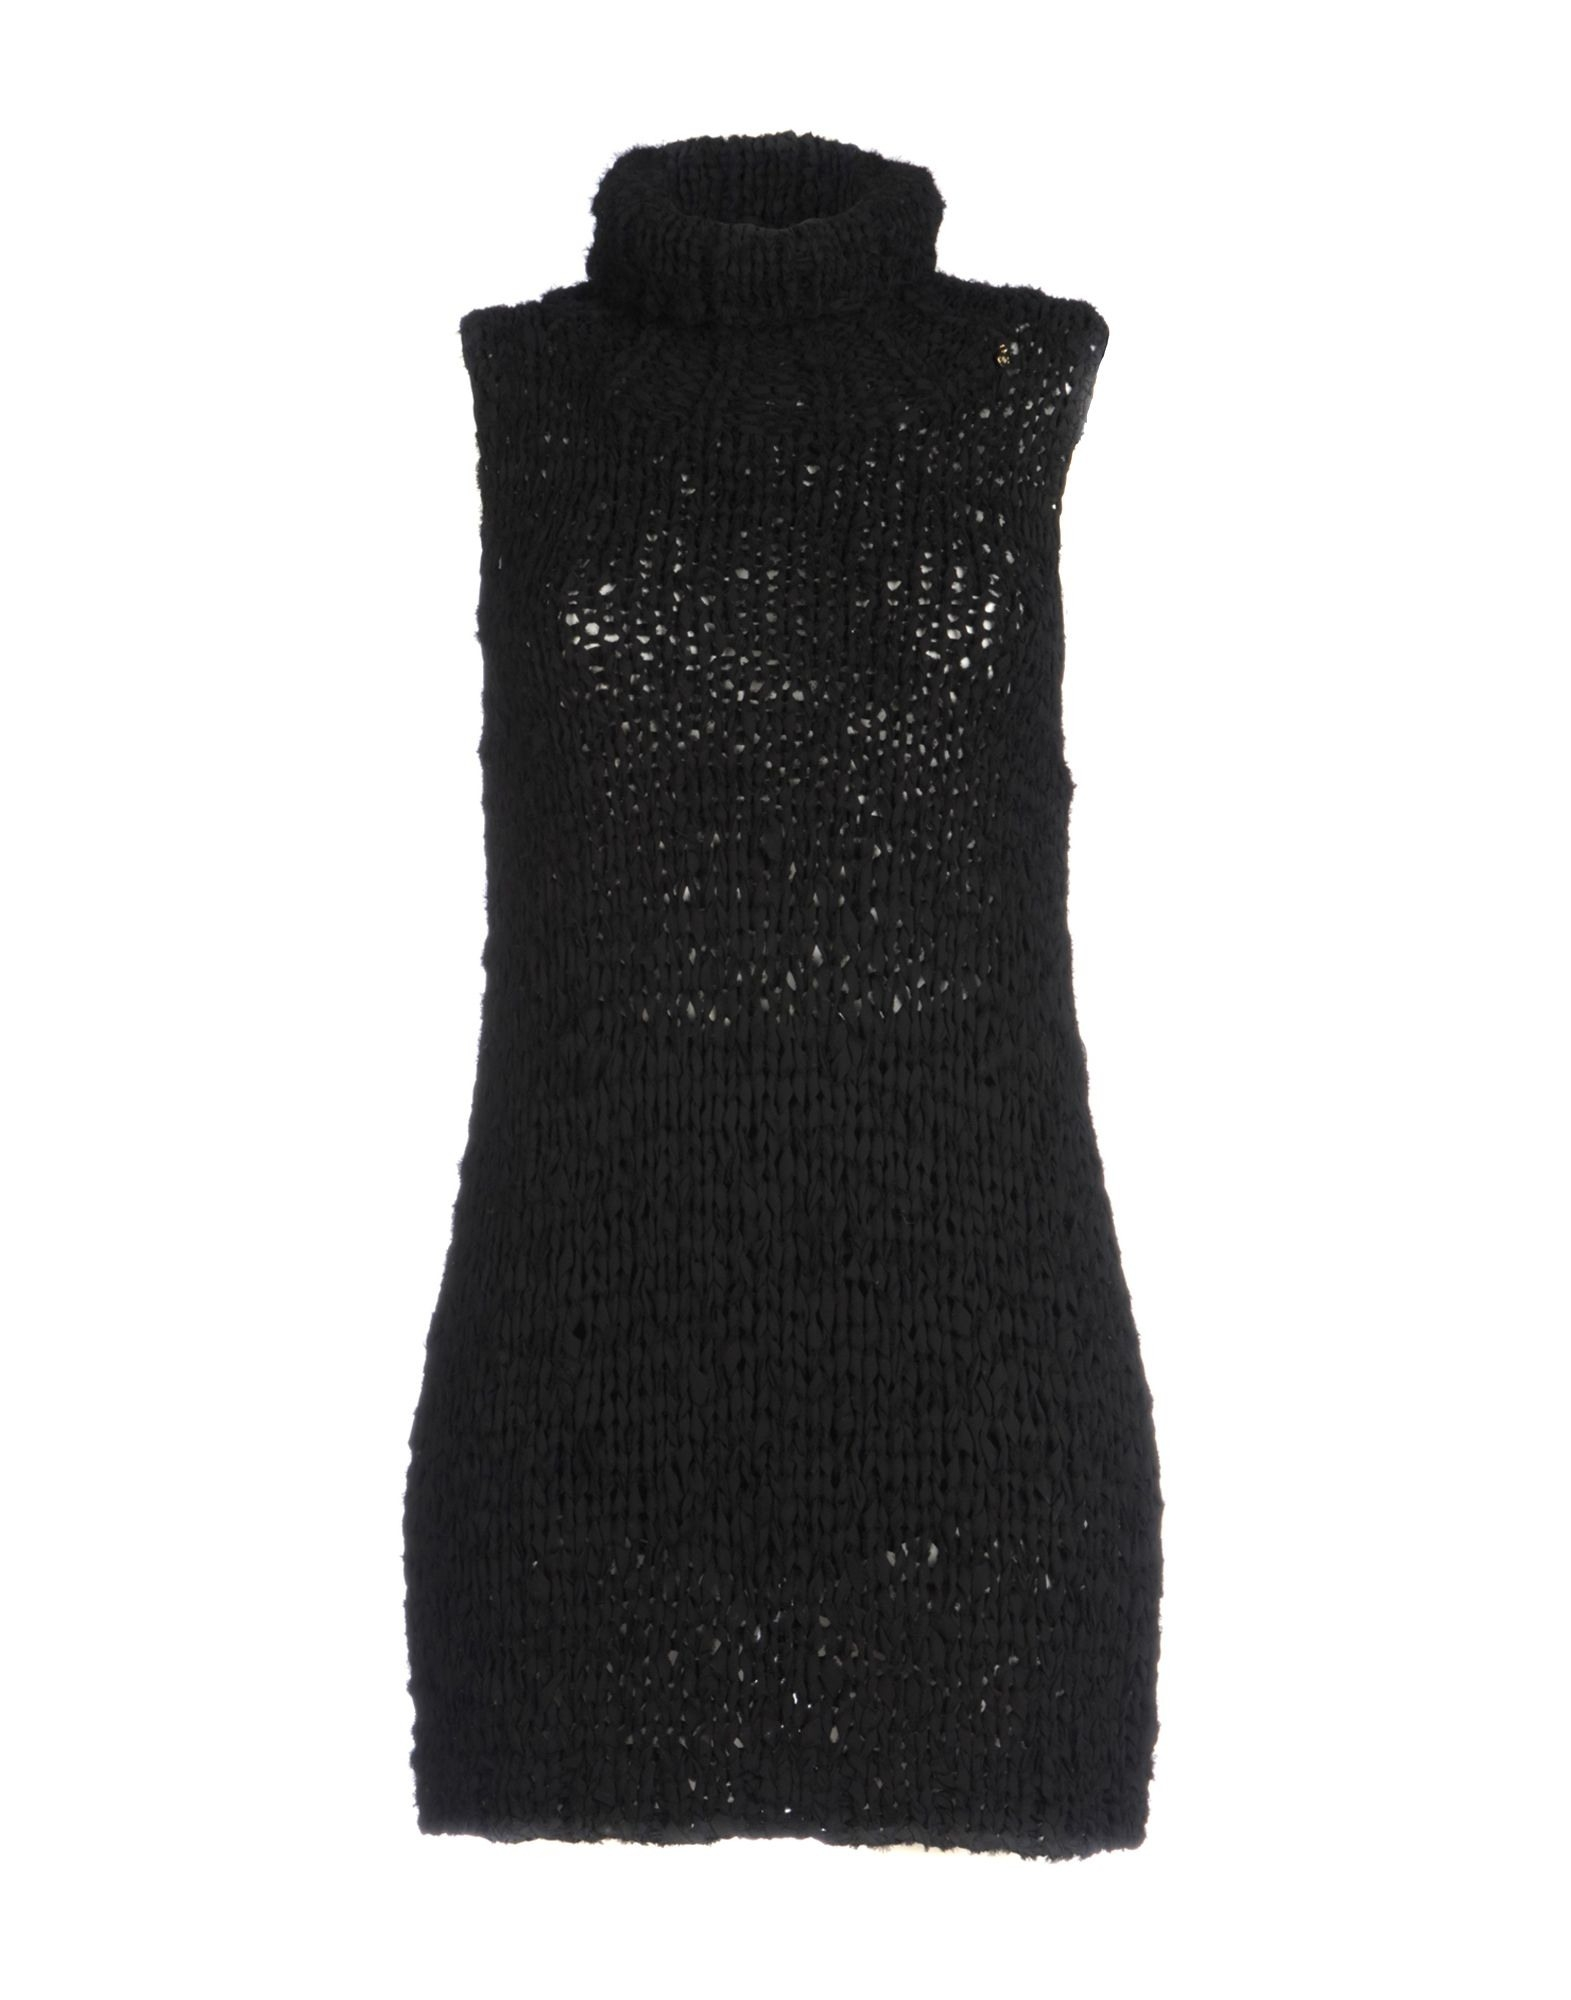 10 Genial Langes Enges Kleid Vertrieb17 Großartig Langes Enges Kleid für 2019